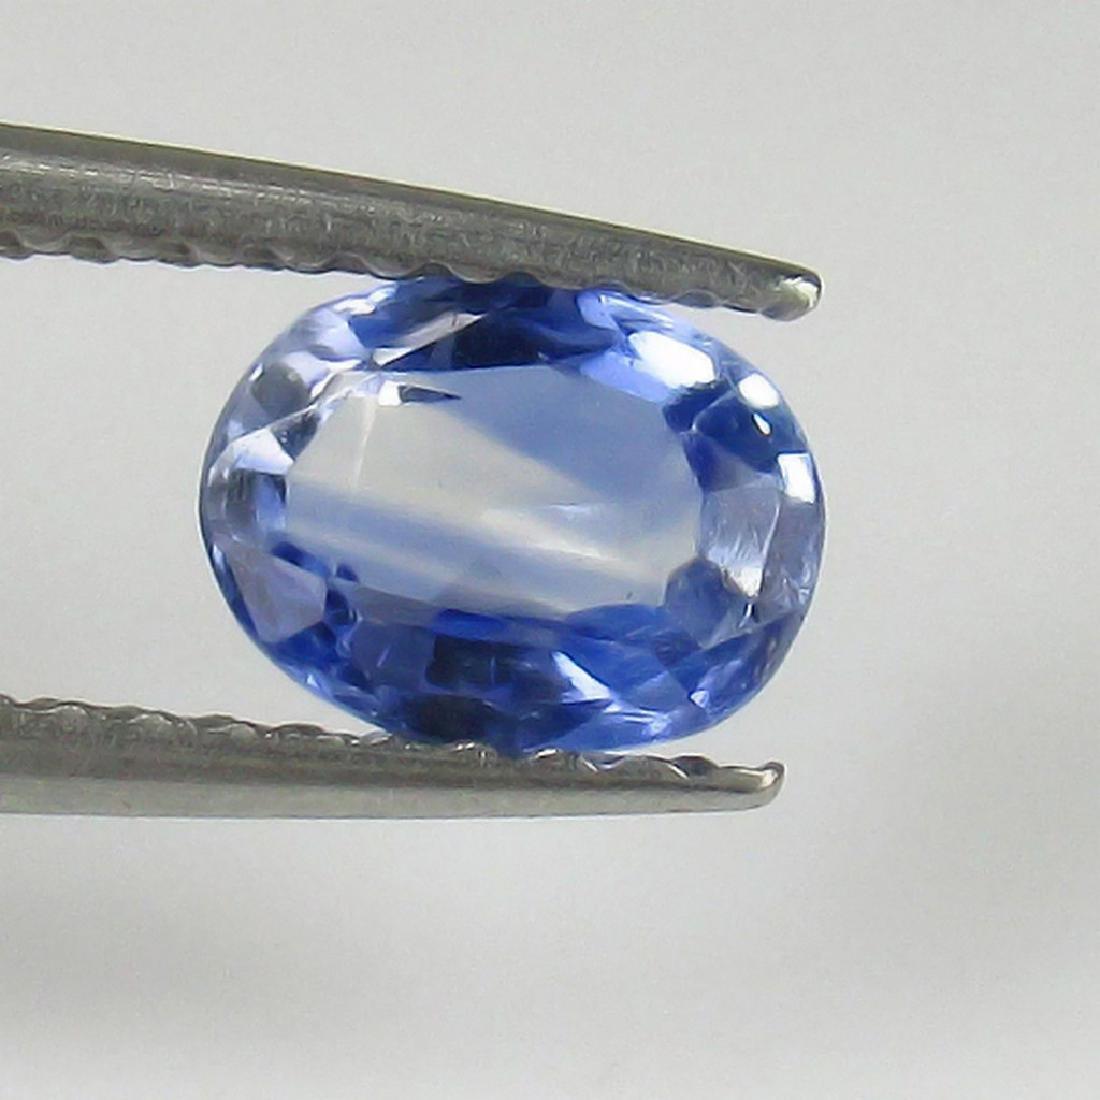 0.75 Ct Genuine Ceylon Blue Sapphire Top Quality Luster